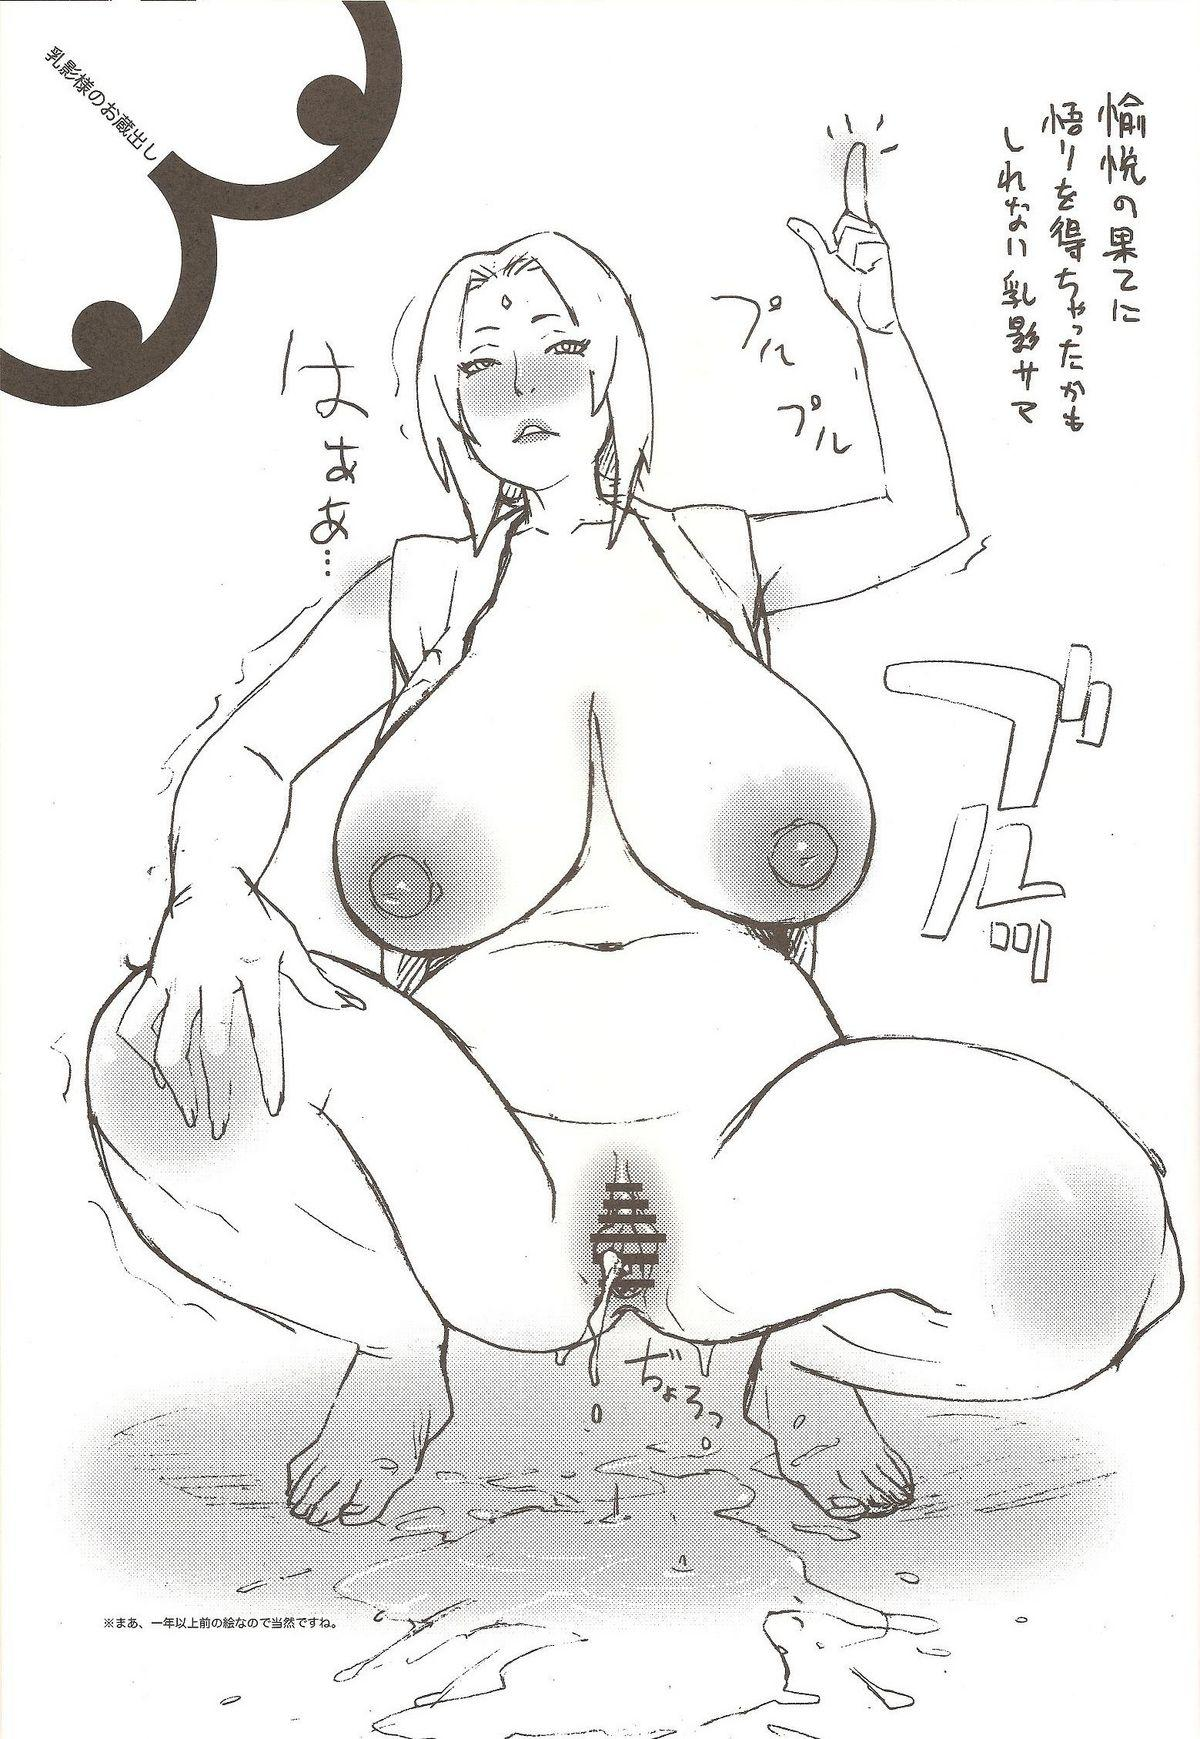 AbRAdEli kAMiTAbA No. 01 Chichikage Hanjouki 19